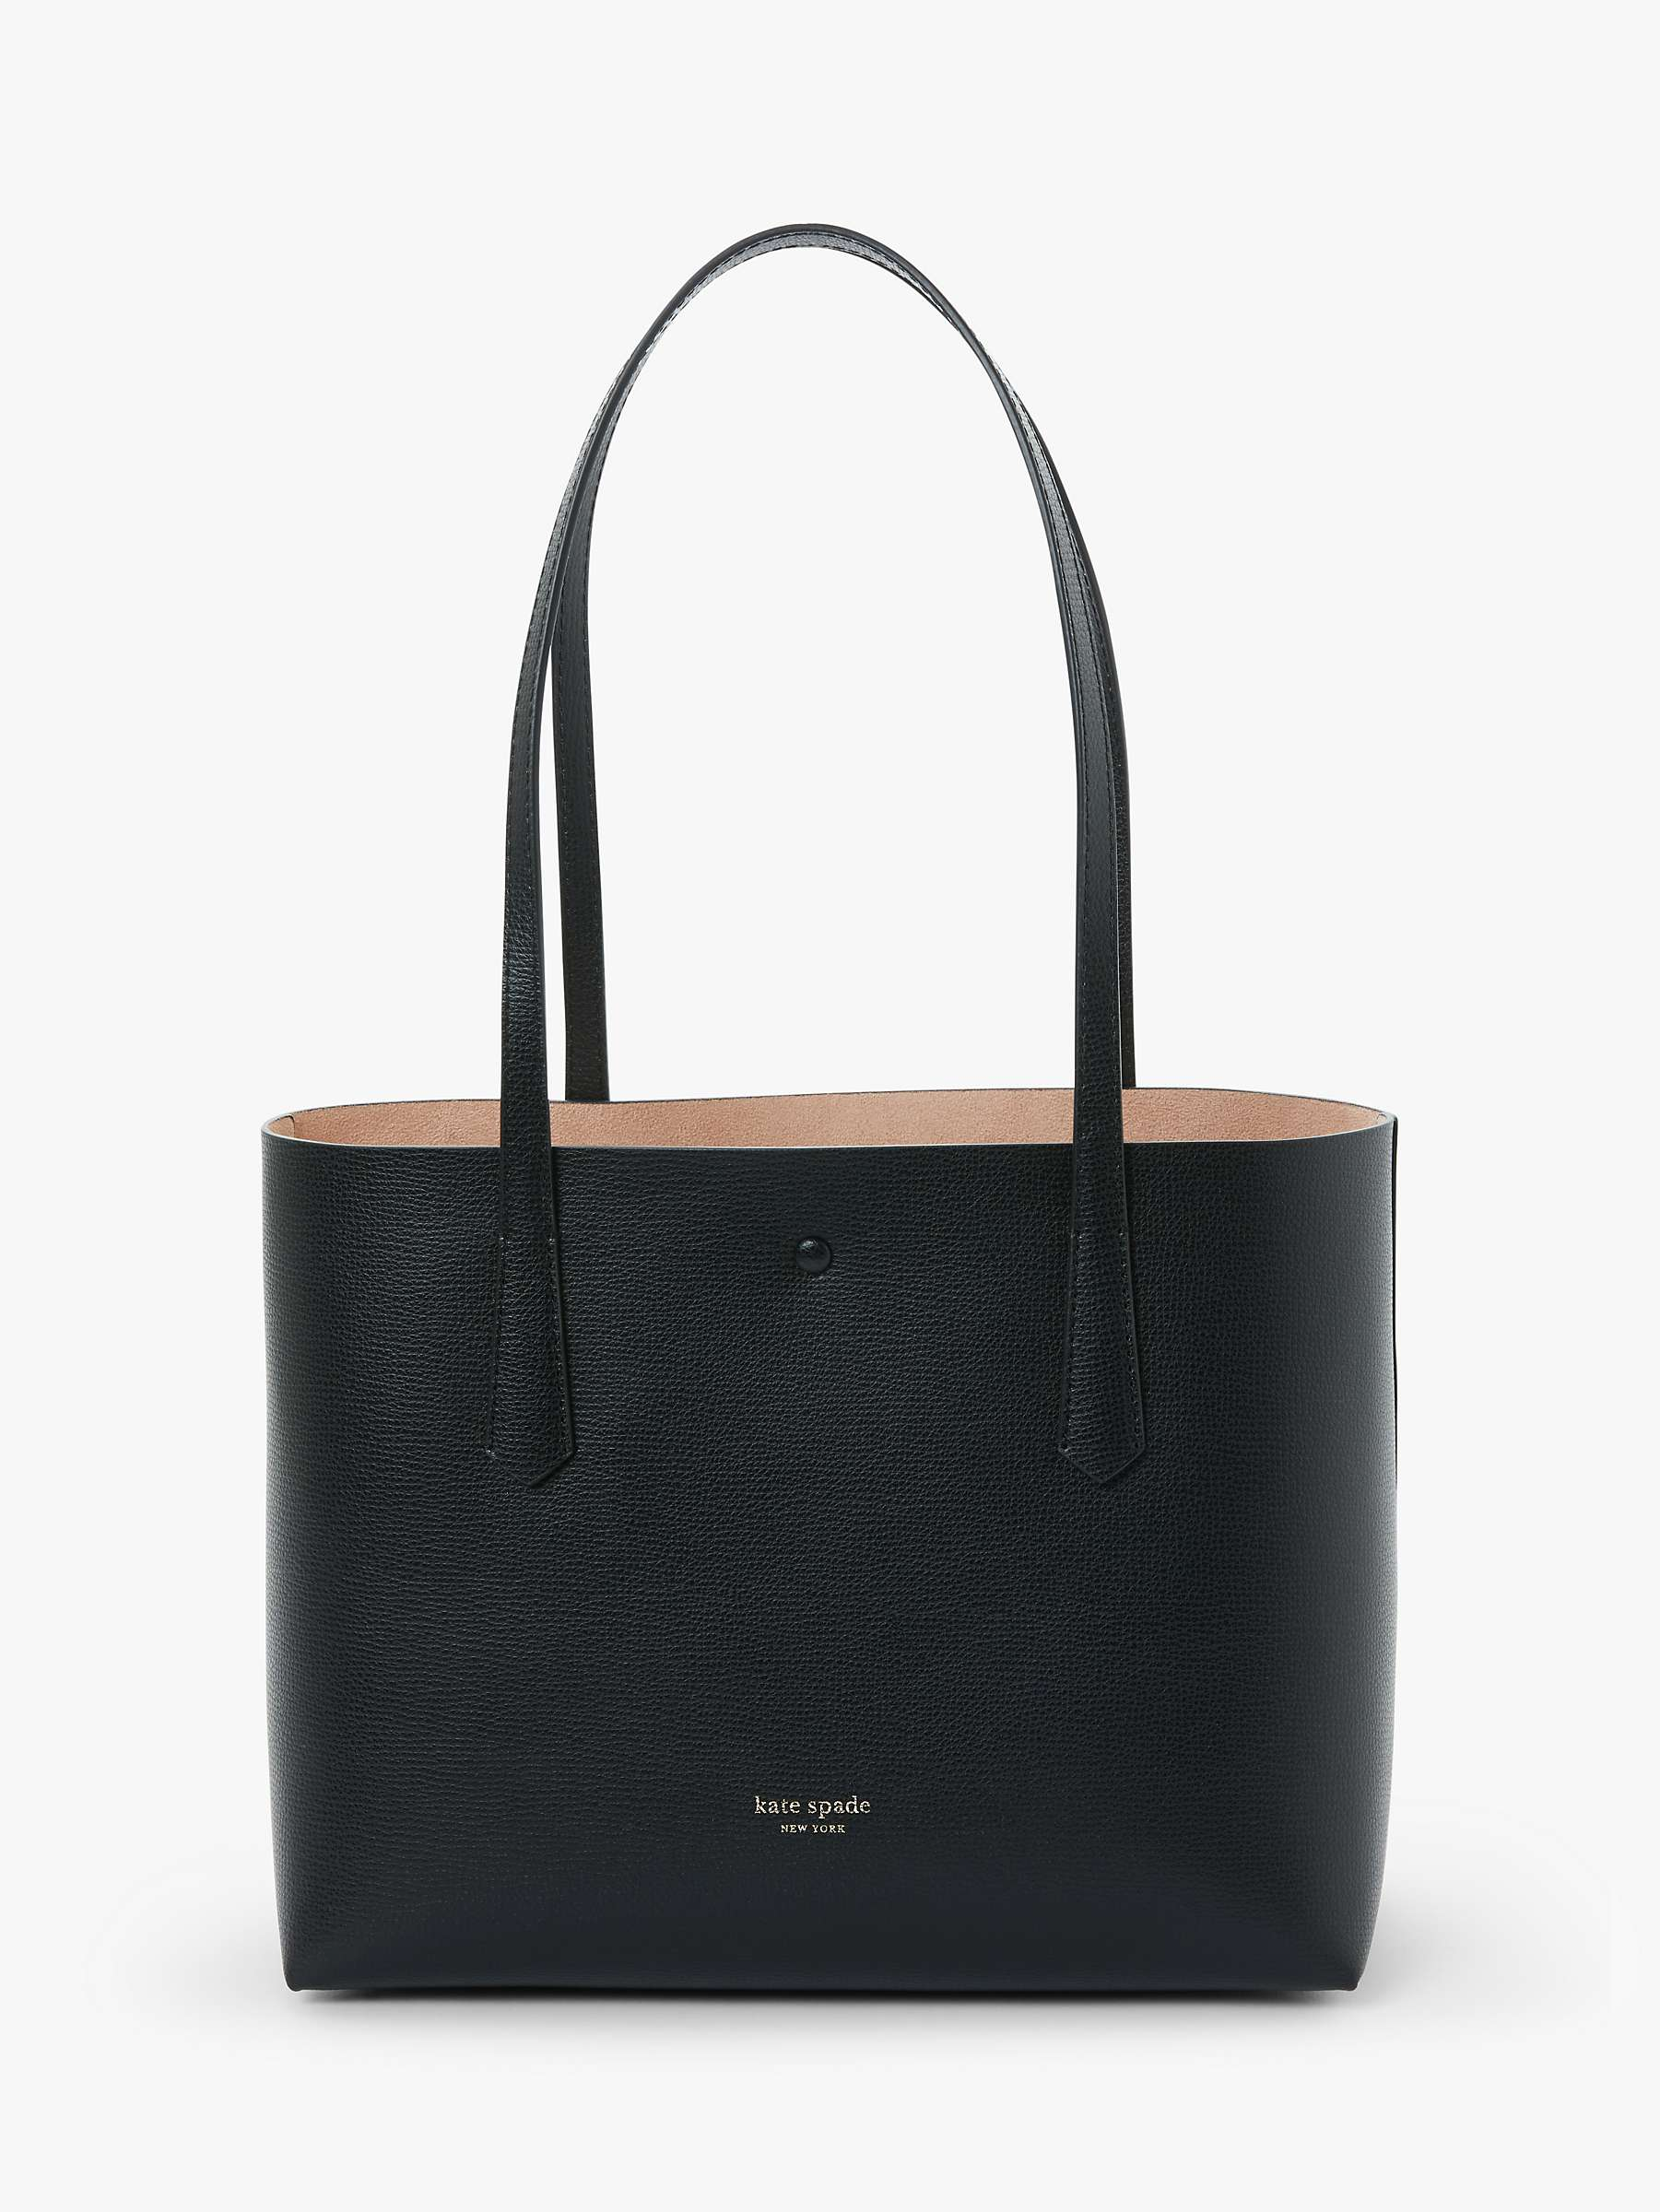 Kate Spade New York Molly Small Tote Bag Black